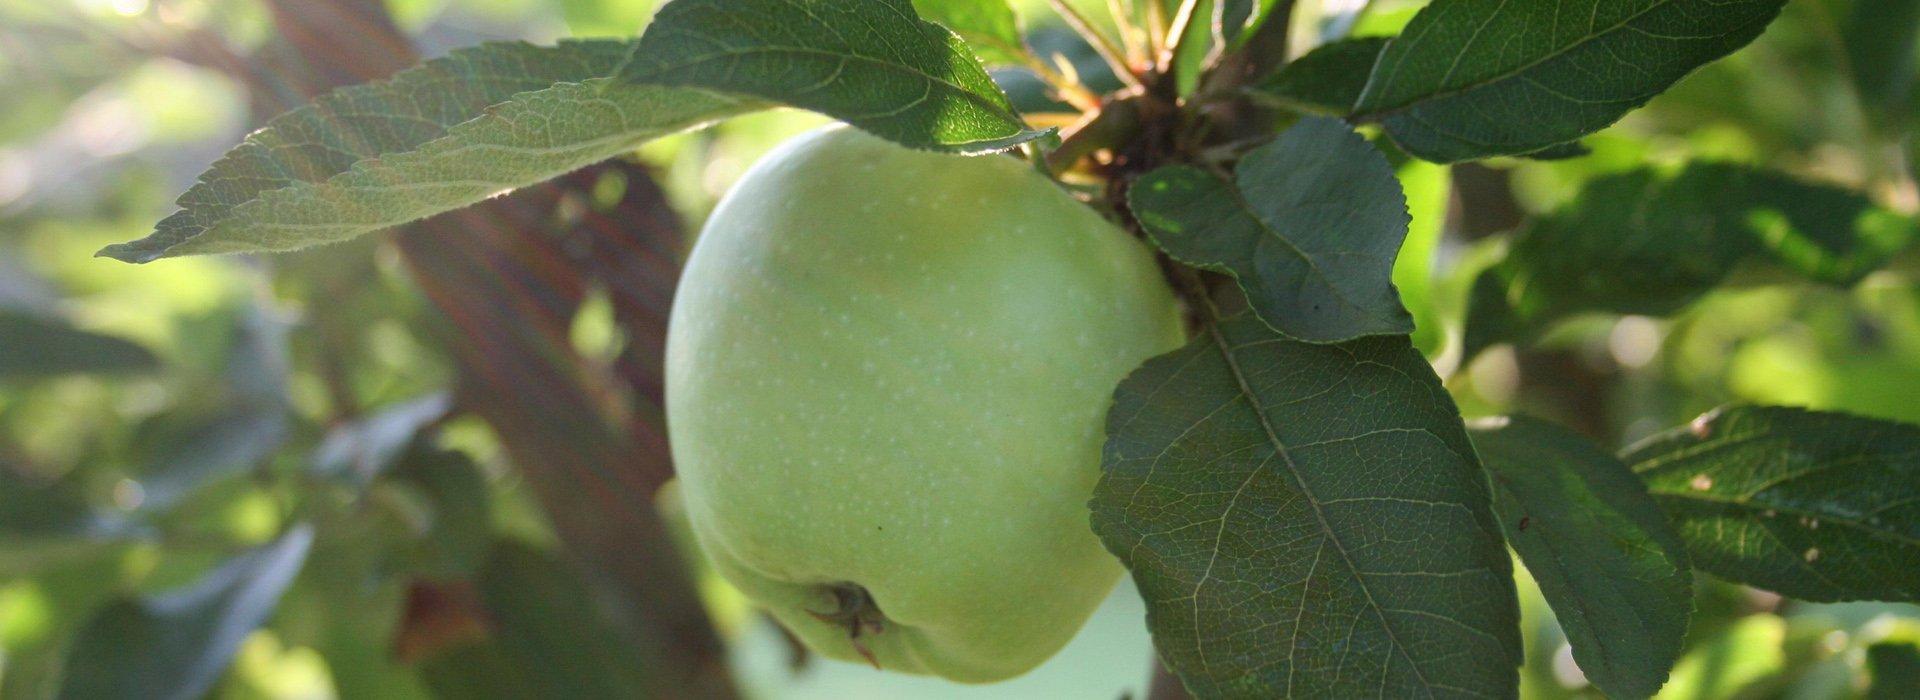 Photo of the apple tree